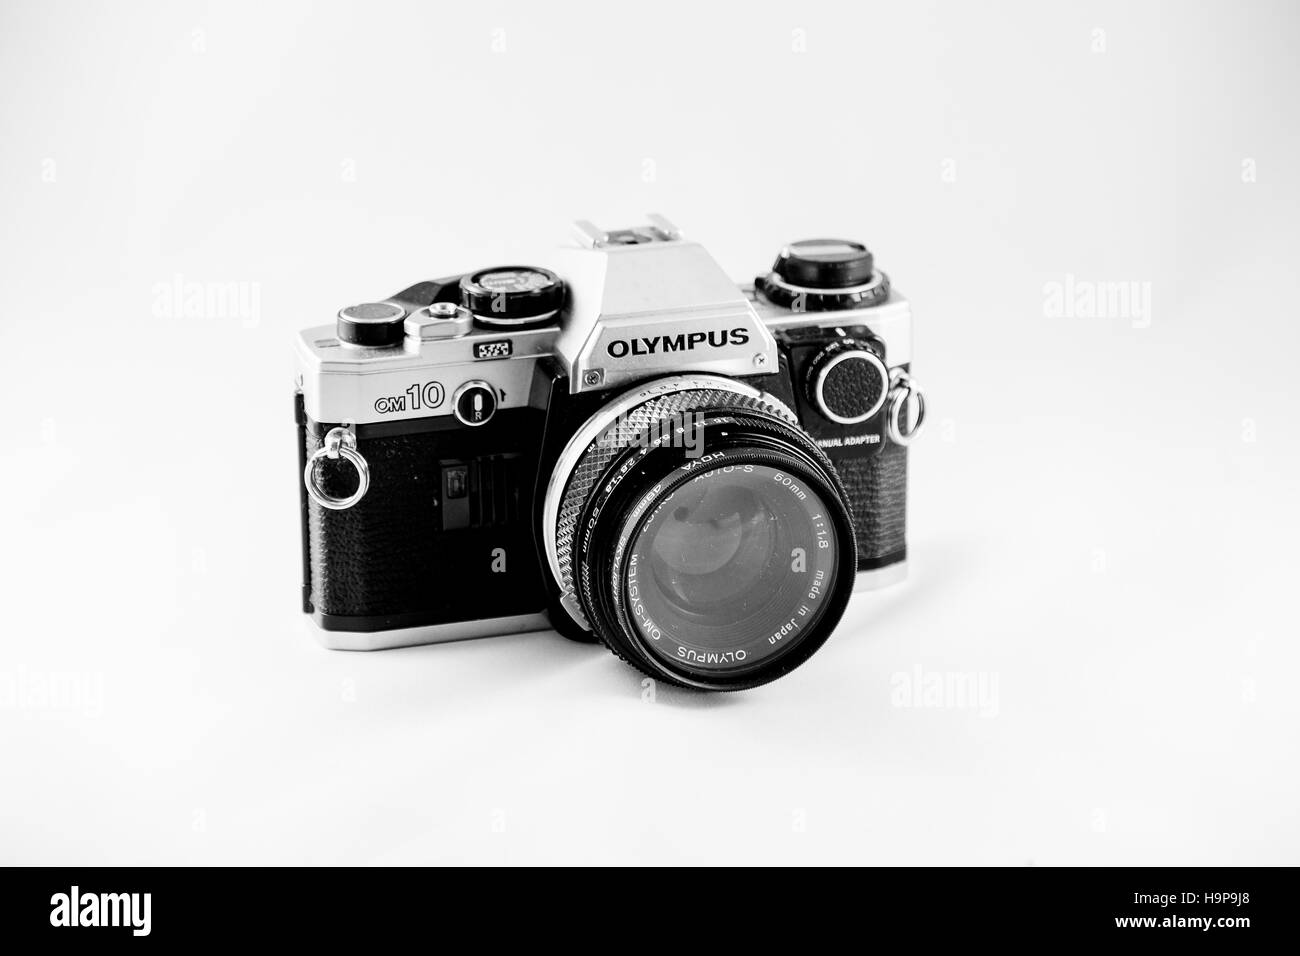 Olympus OM10 SLR Film Camera - Stock Image